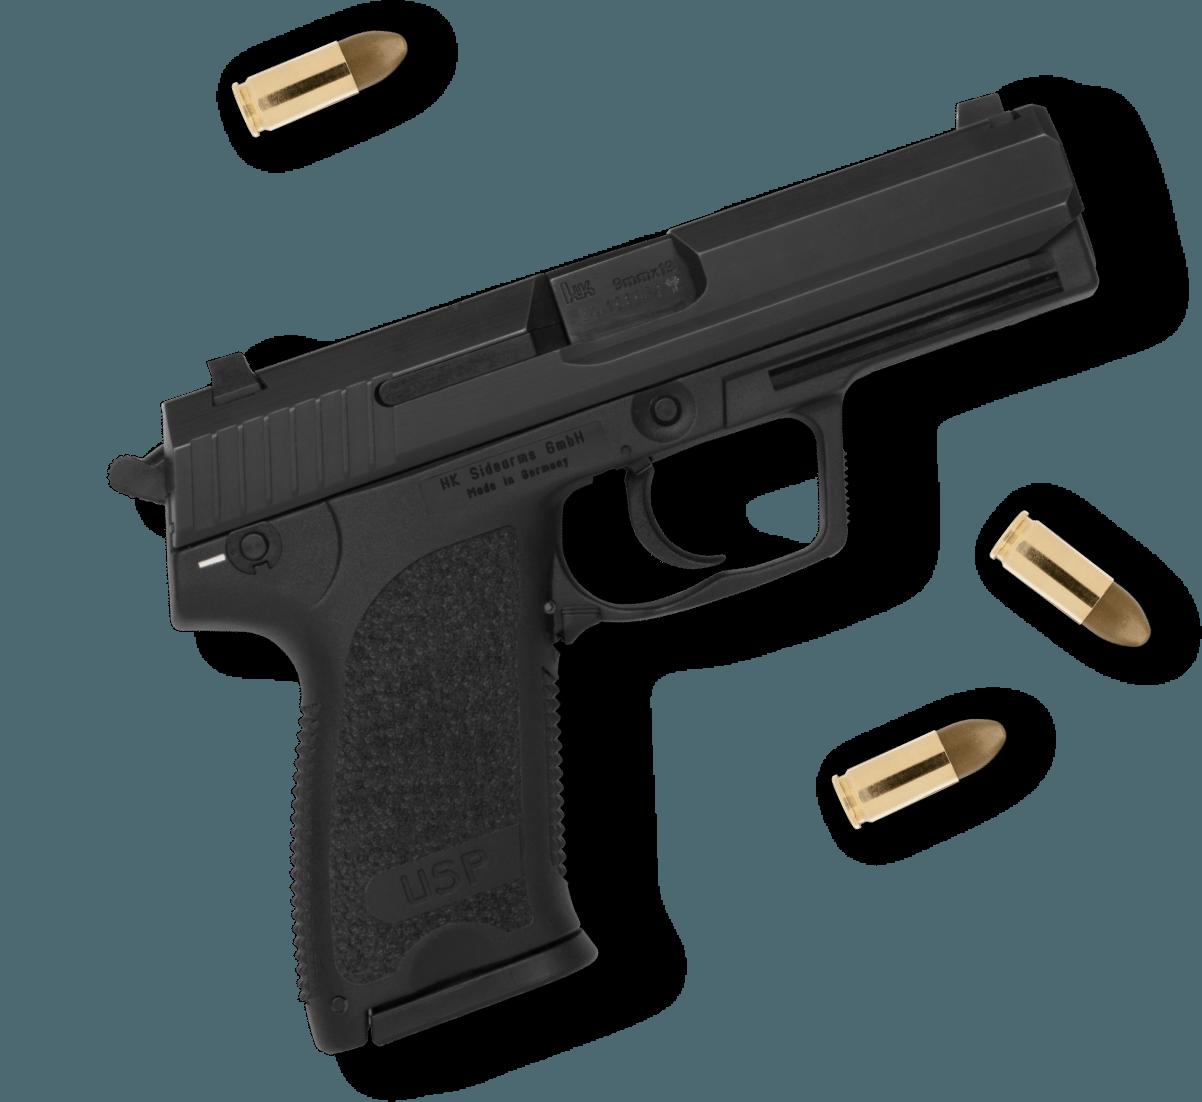 SIM-X - SIM-X ammunition yields ultra-high velocity, low recoil